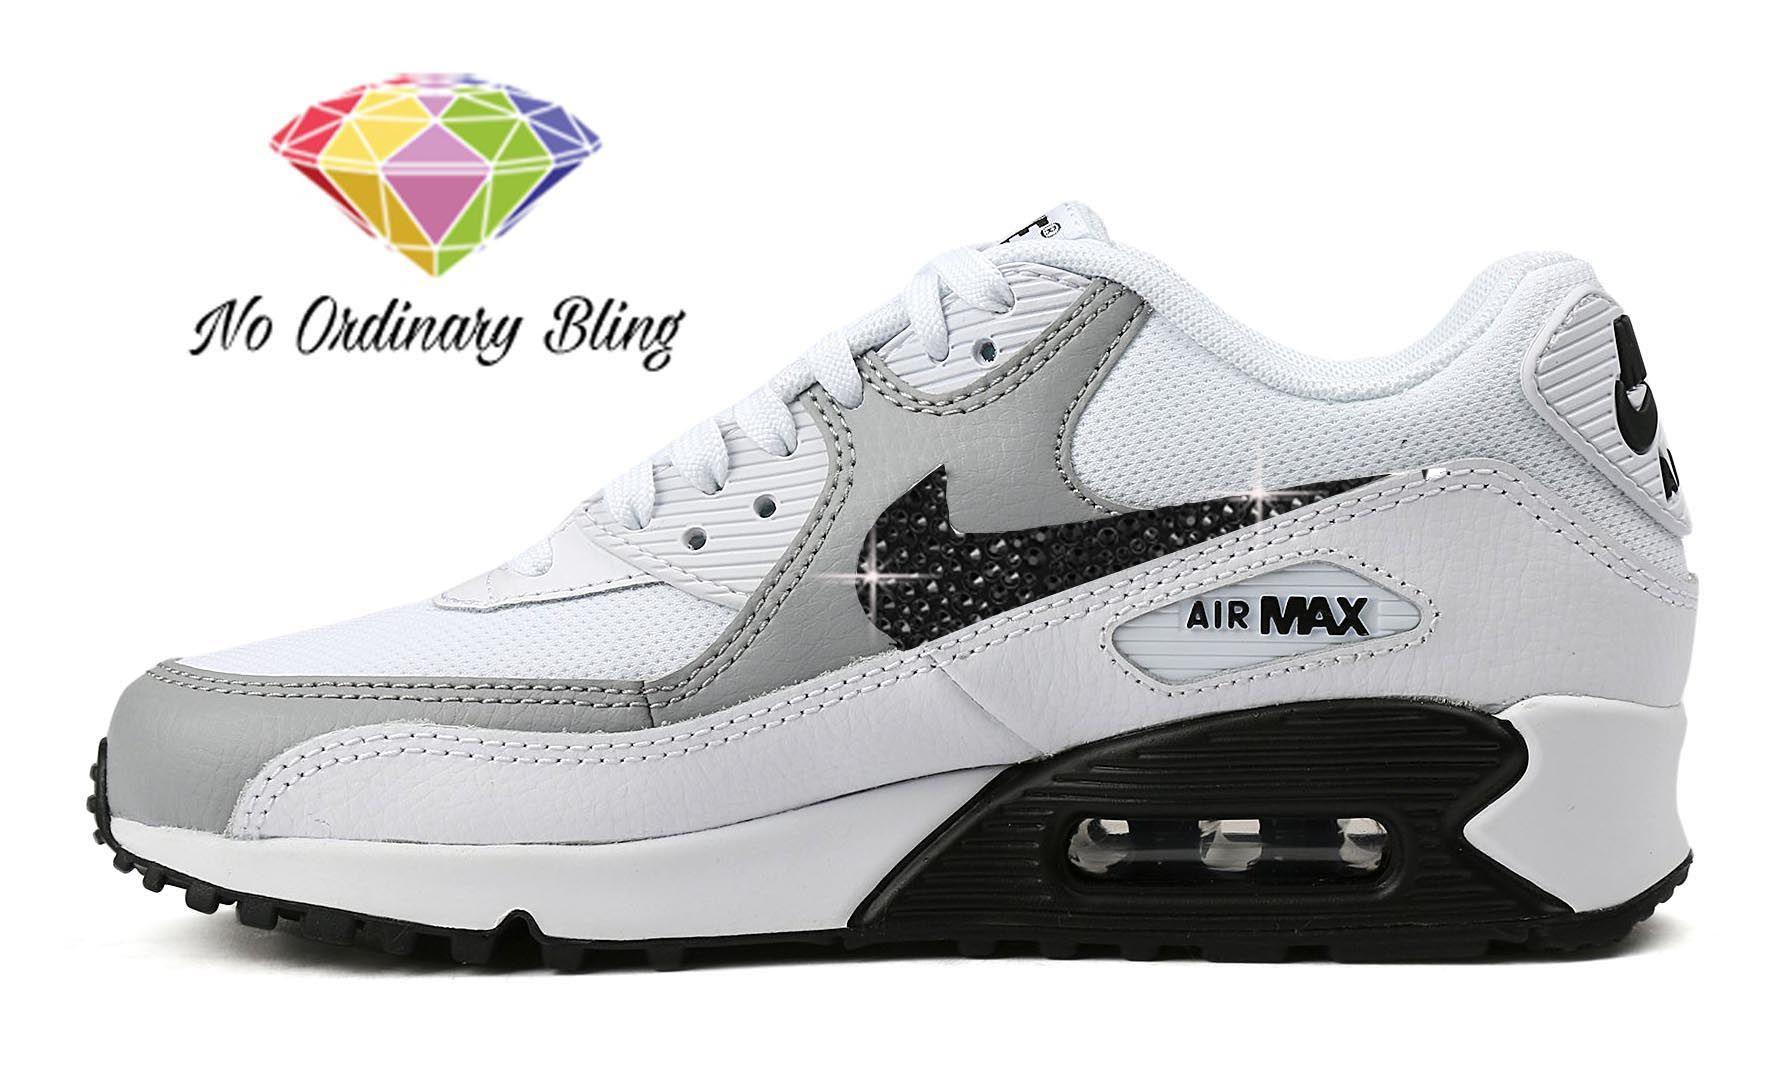 b2b98f2f0ee9 Black Bling Nike Air Max 90 Women s White Grey Blk Swoosh -  NoOrdinaryBling